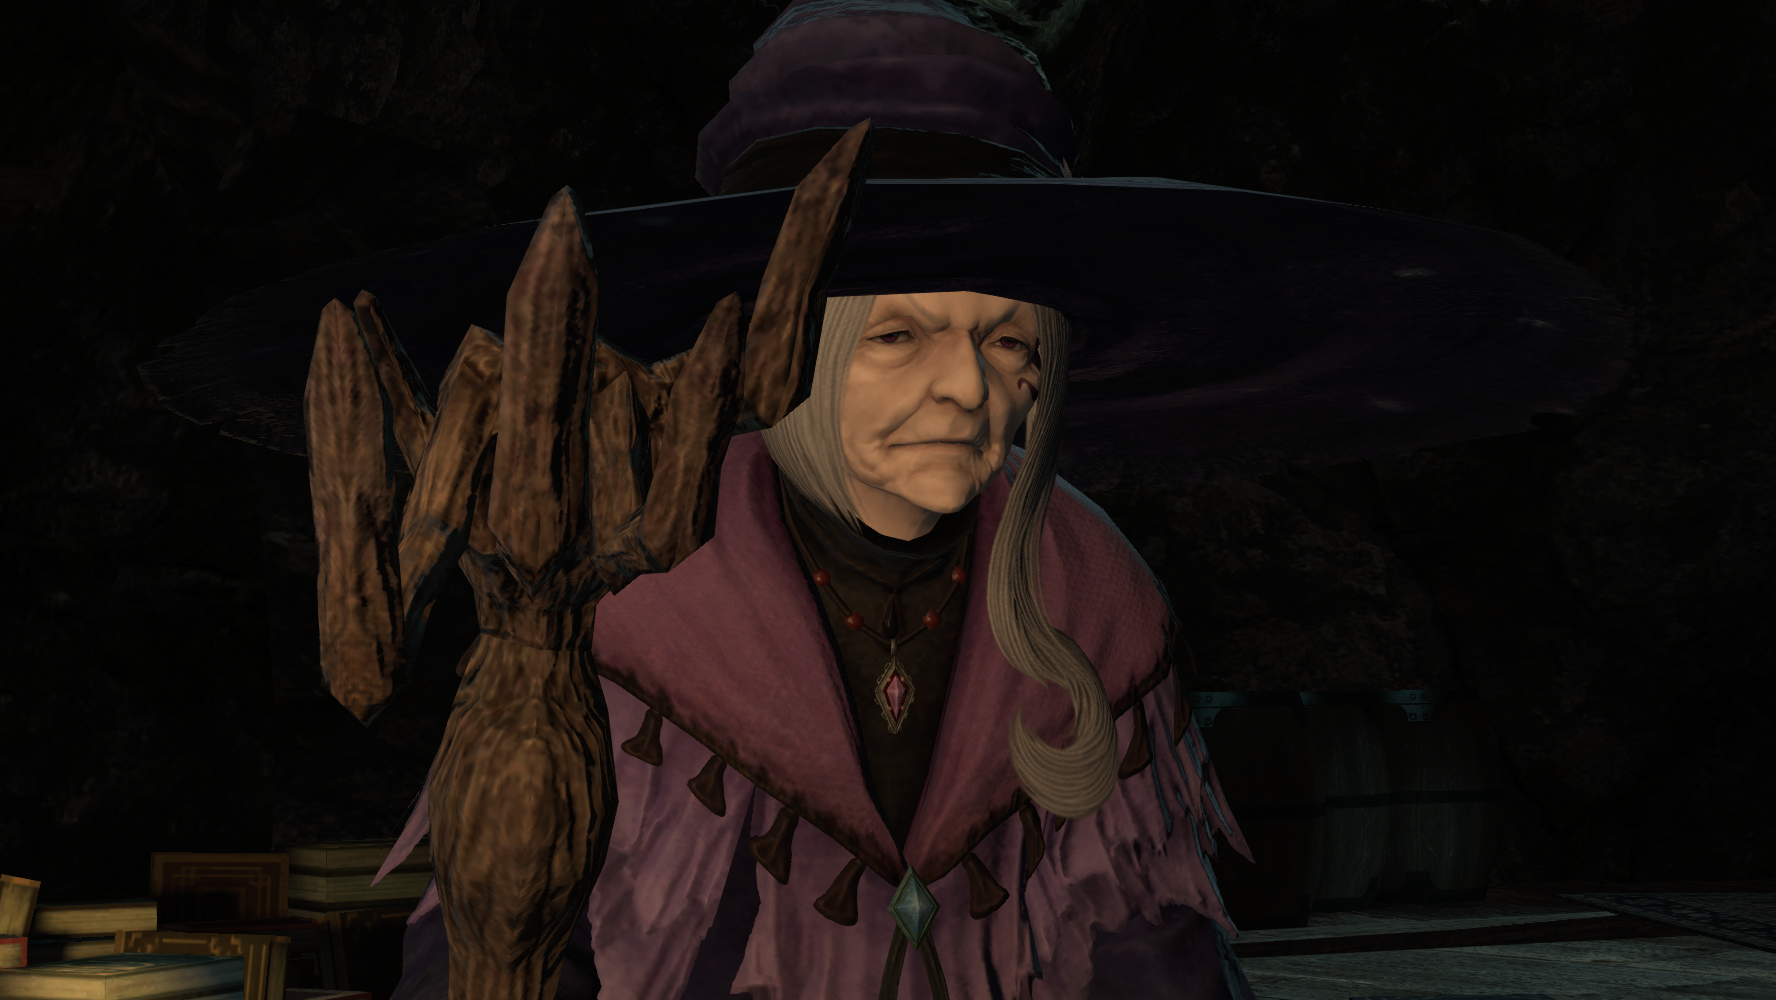 Matoya (Final Fantasy XIV)